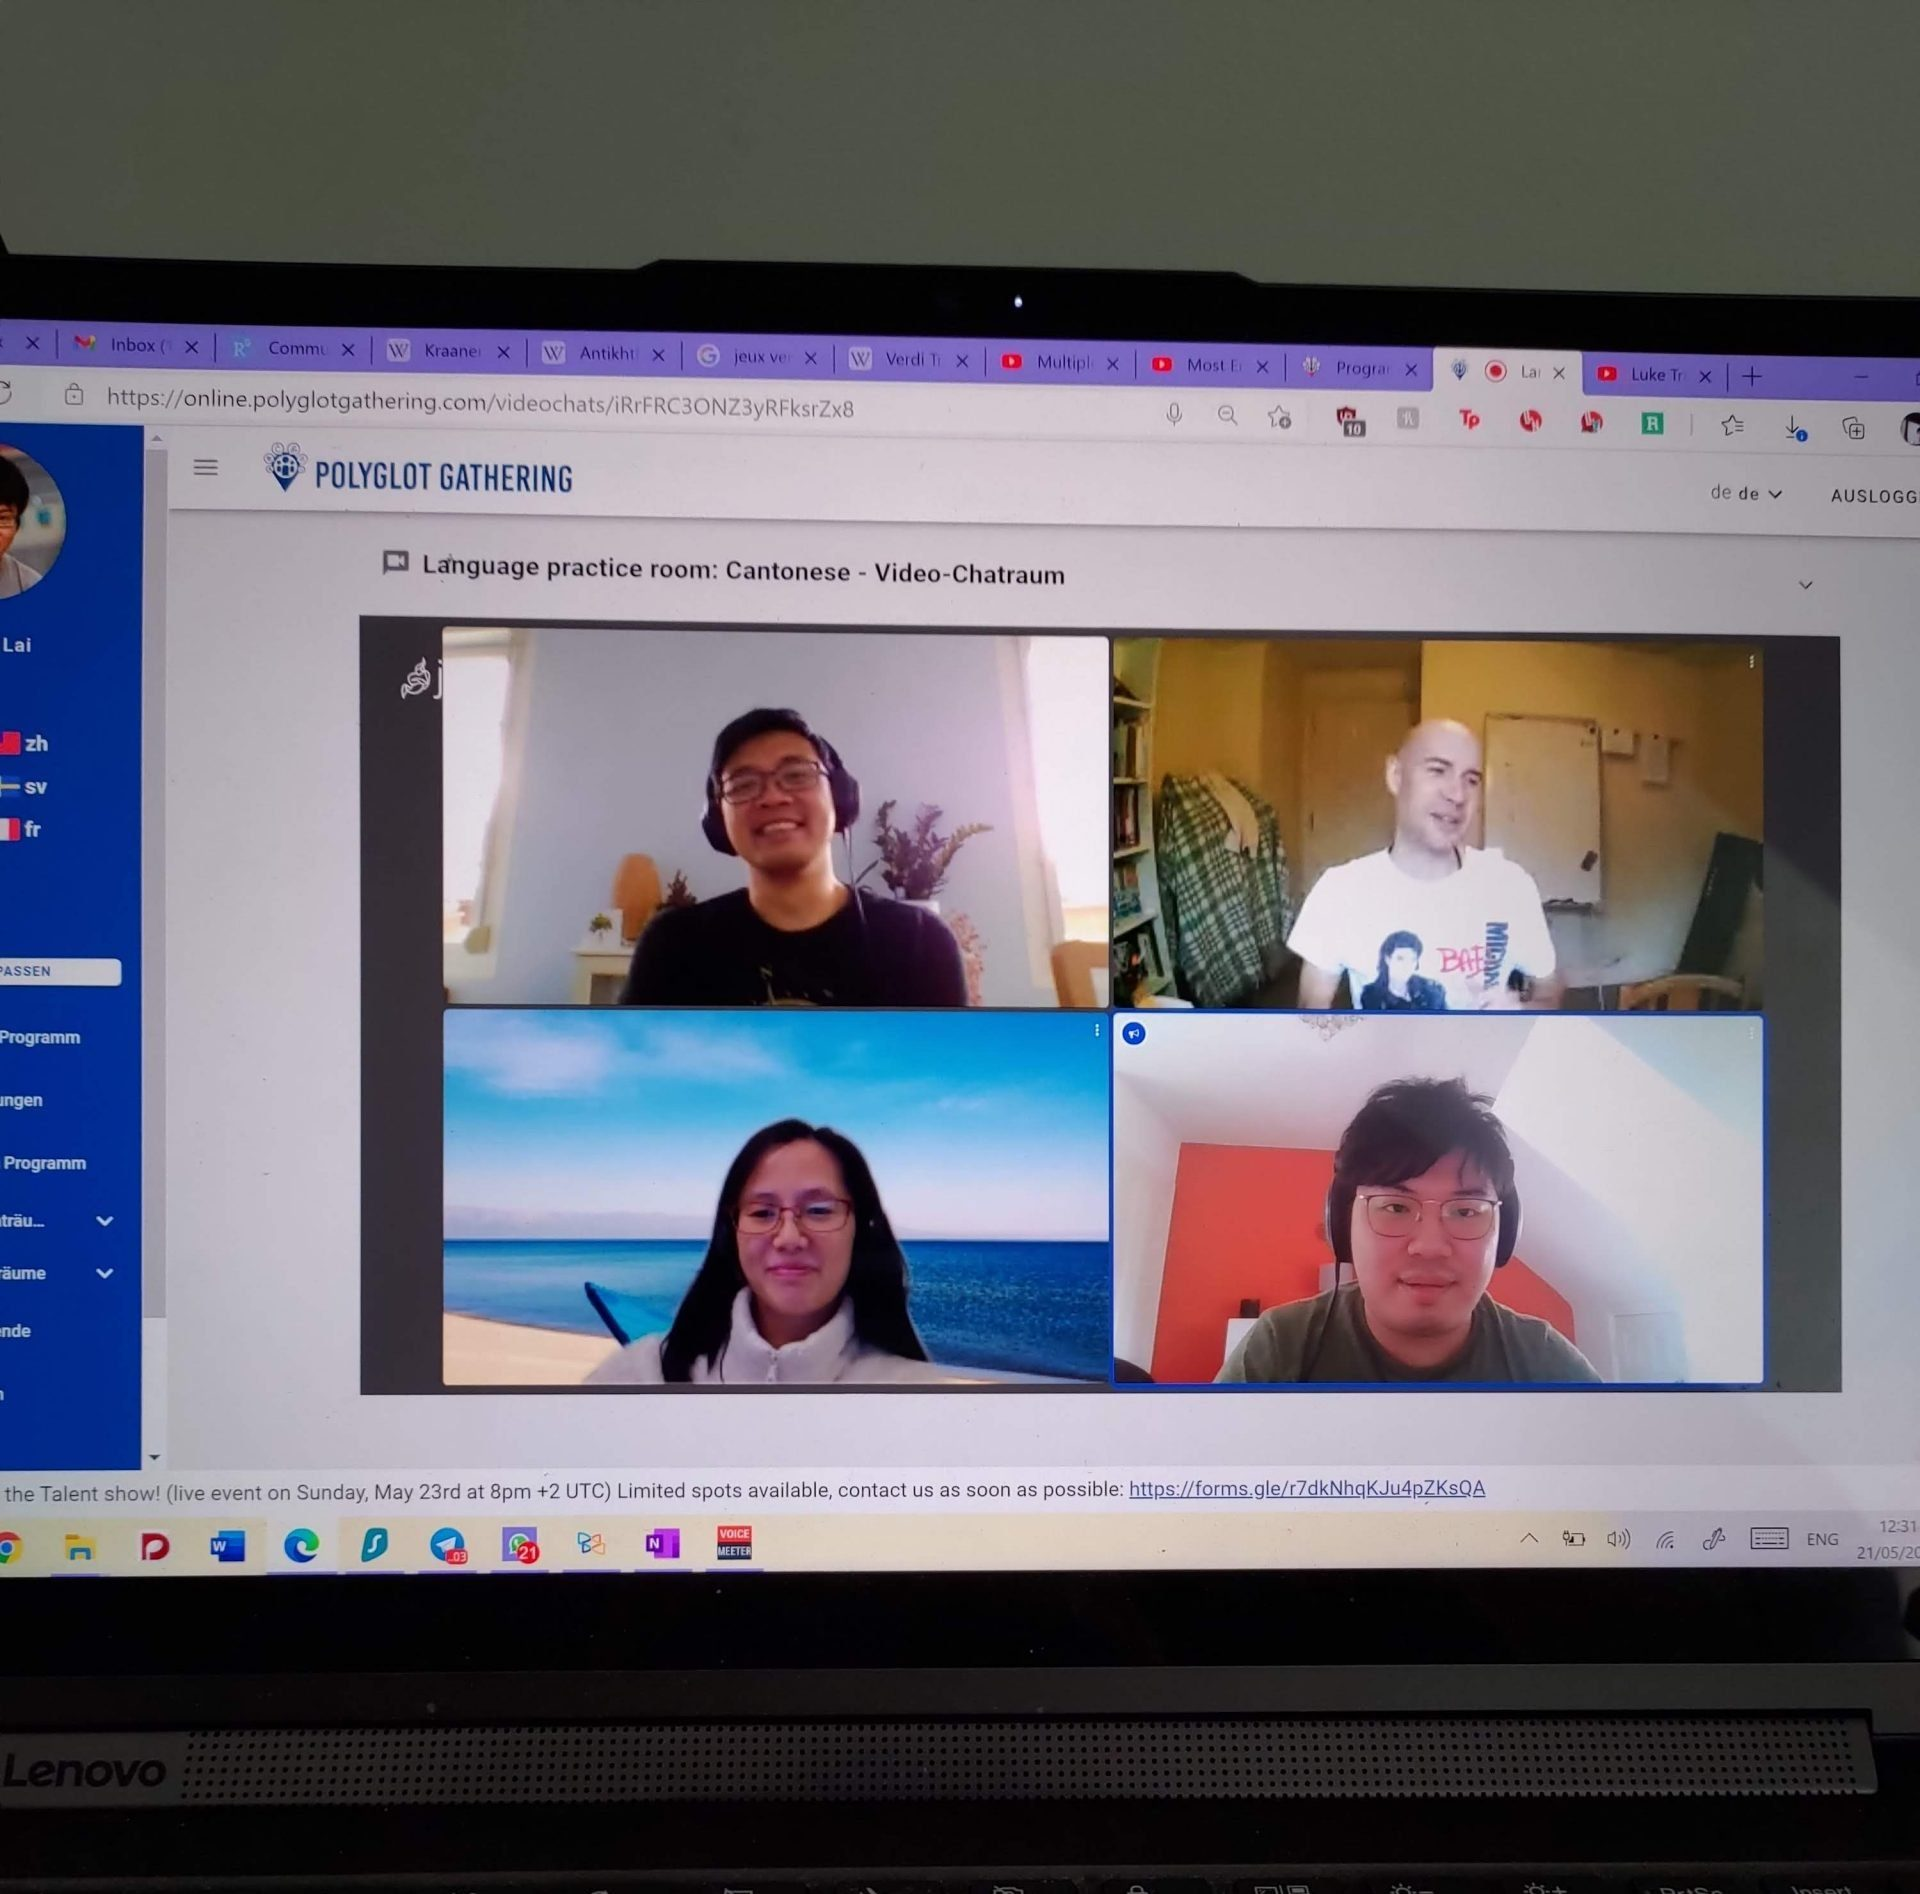 polyglot gathering 2021 Cantonese language practice room